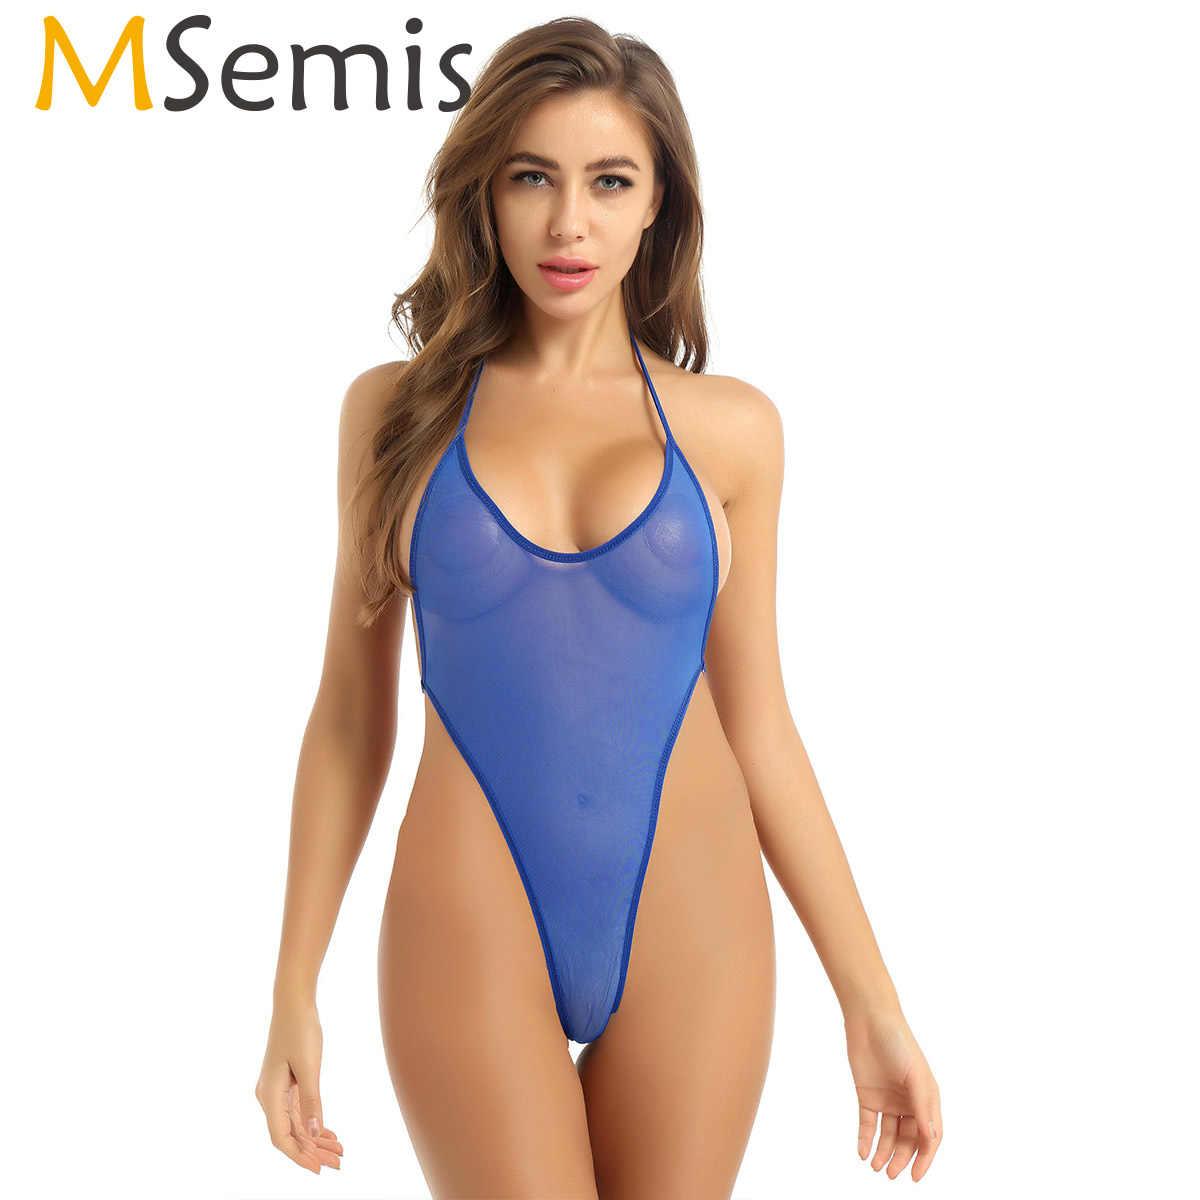 Women/'s Strappy Bikini Micro G-string Thong Lingerie Underwear Bodysuit Swimwear